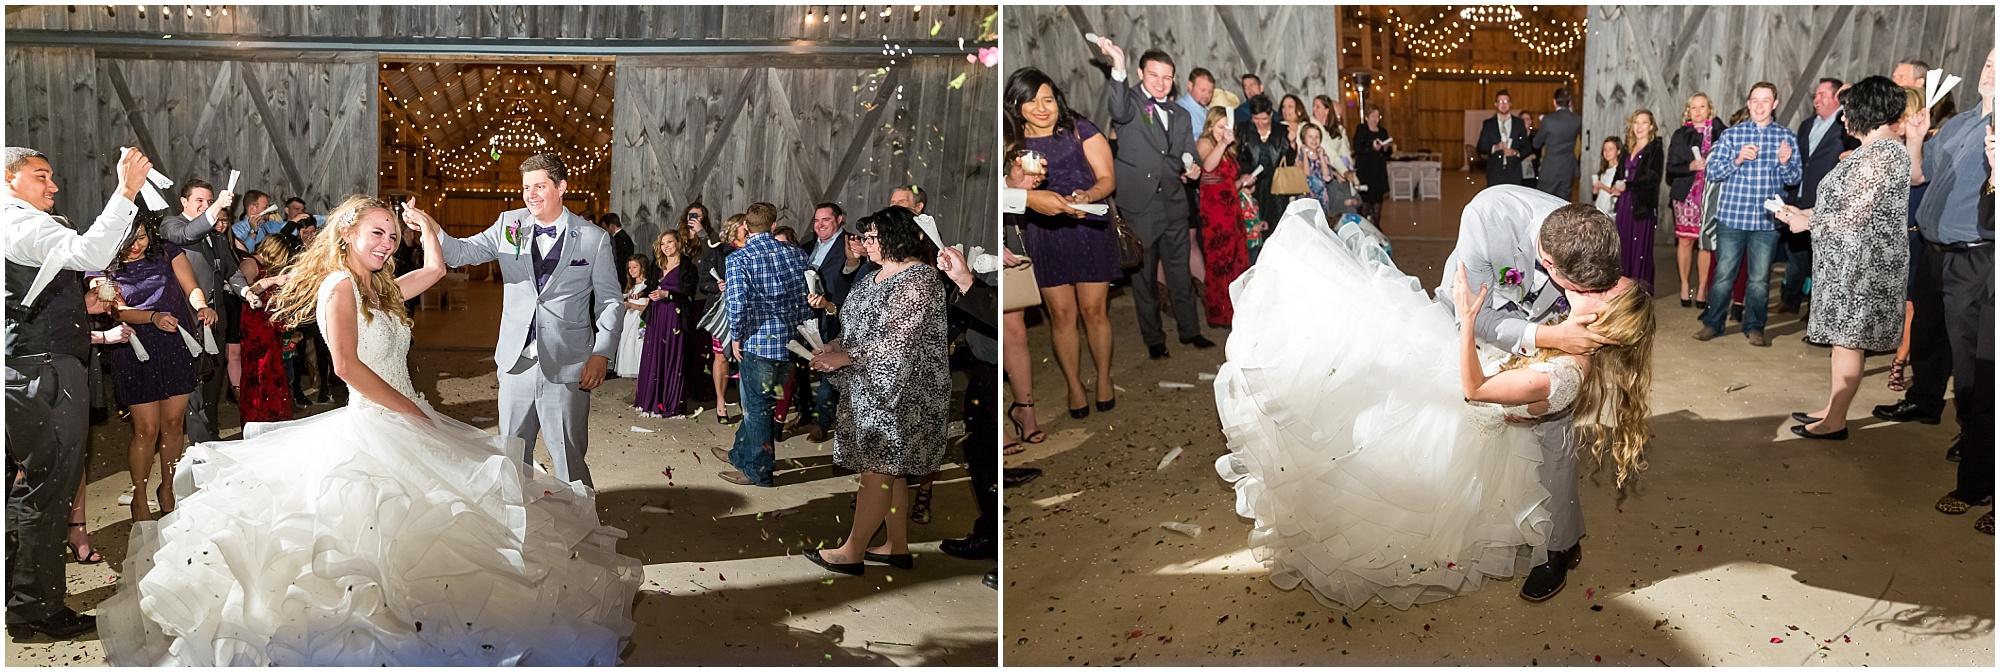 Disney-Inspired-Wedding-Central-Texas_0070.jpg